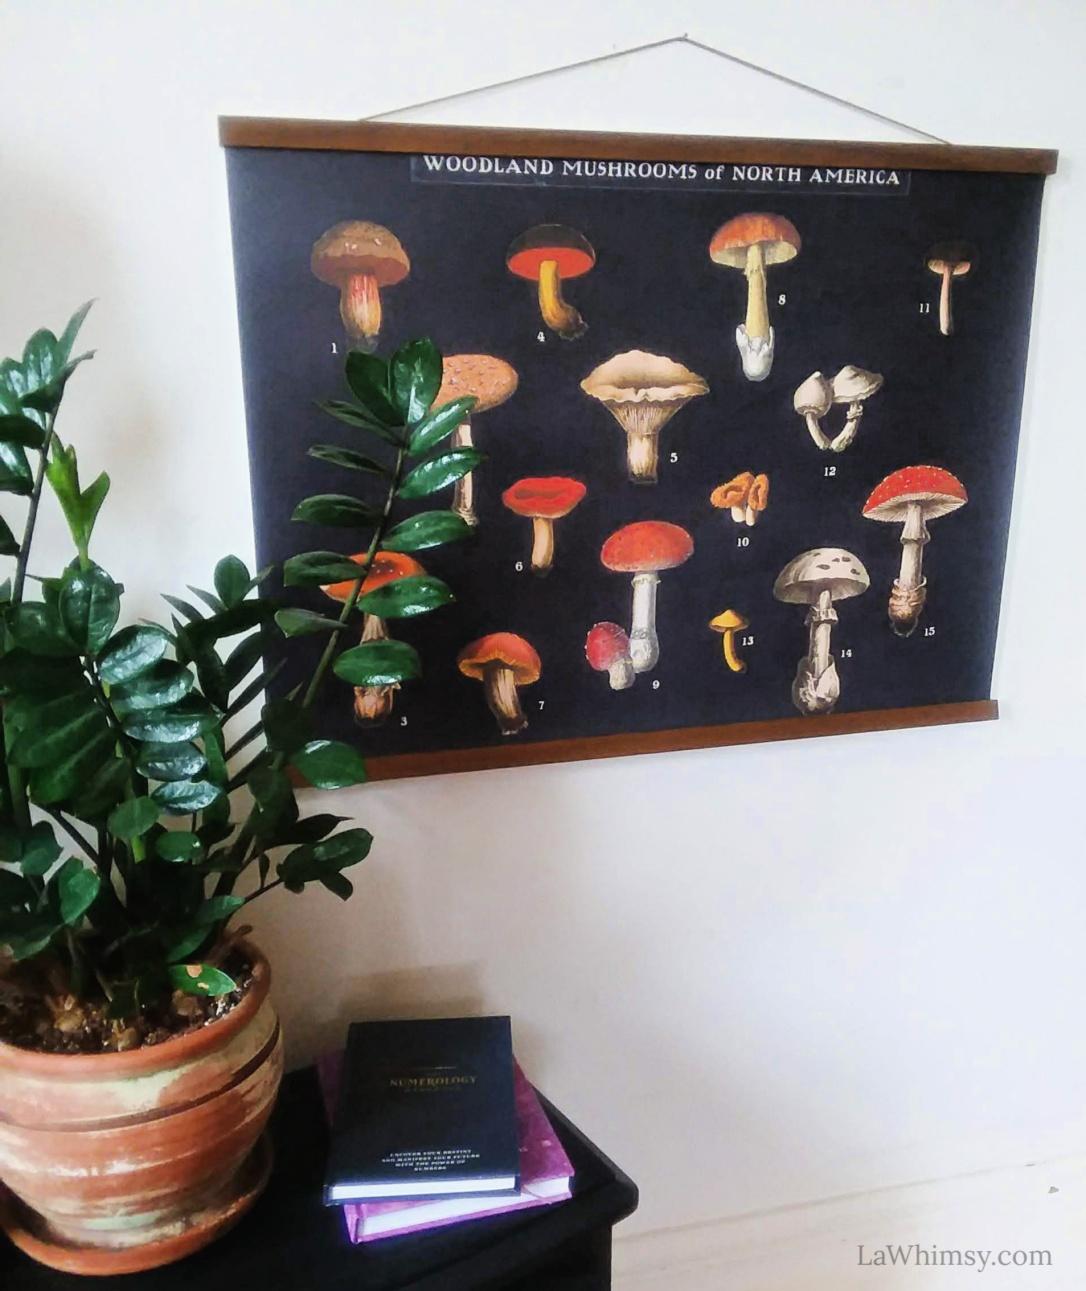 Mushroom Chart Wall Art via PhotoWall on LaWhimsy